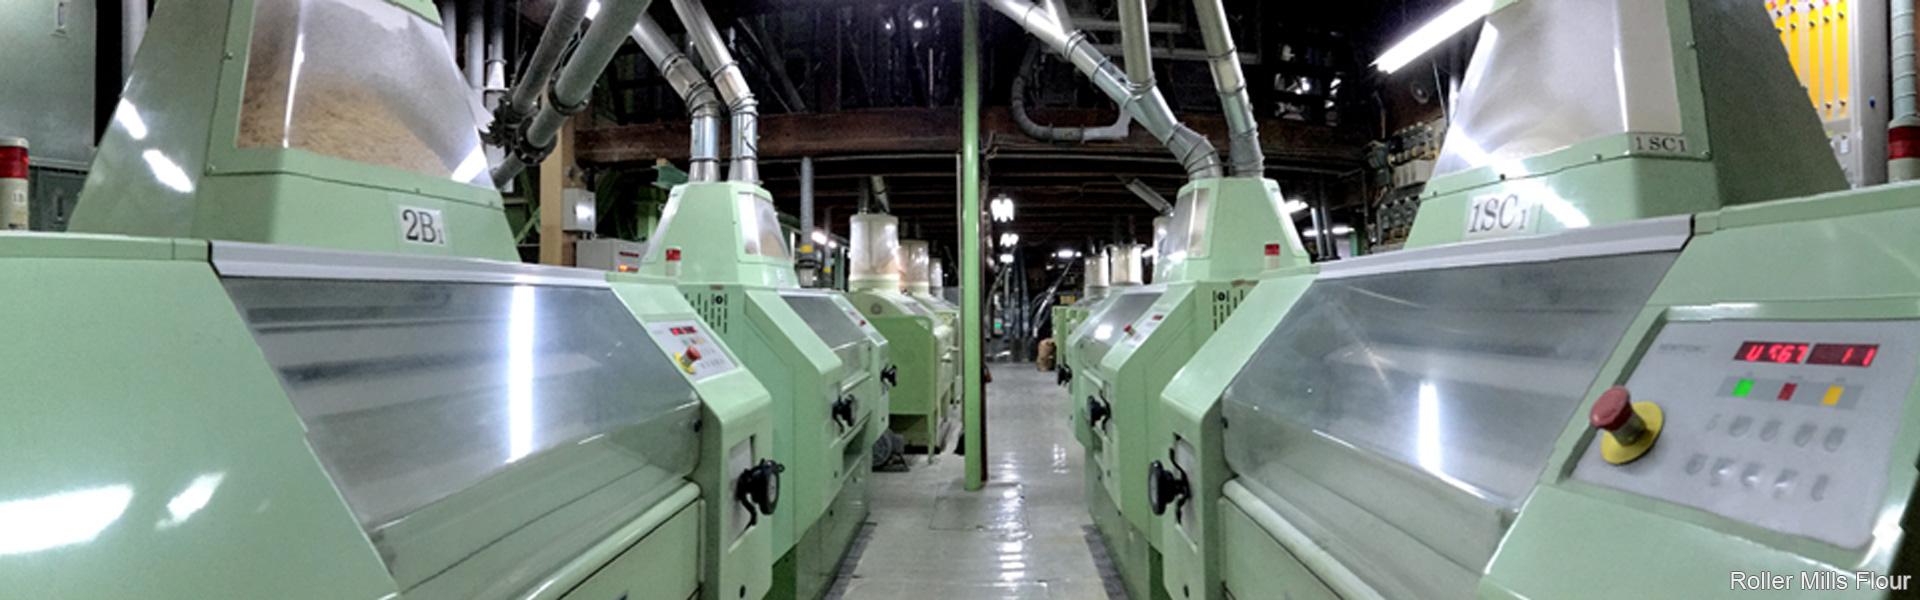 Roller Mills Flour